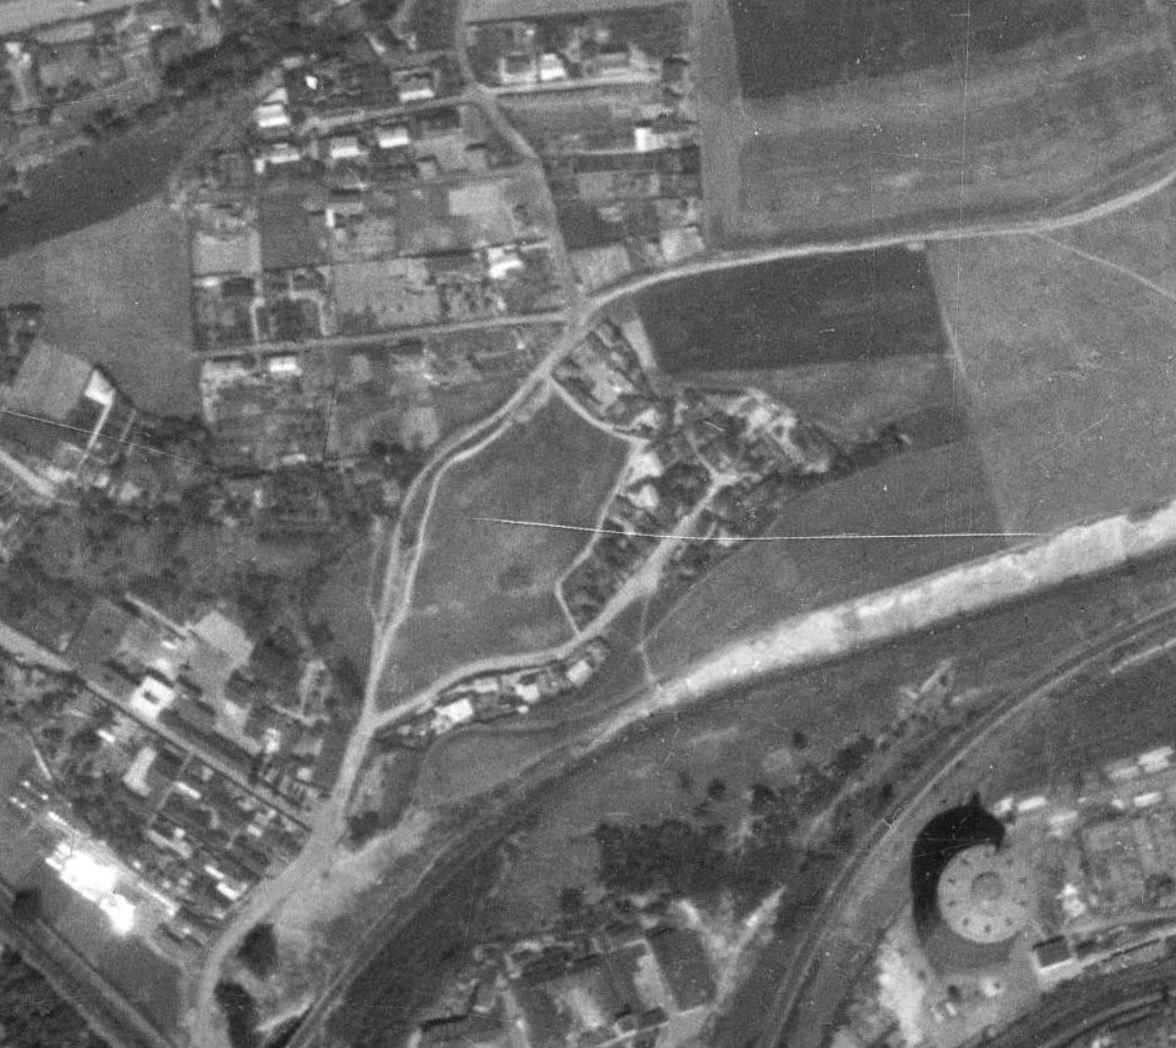 nouzova-kolonie-udoli-desu-letecky-snimek-1953